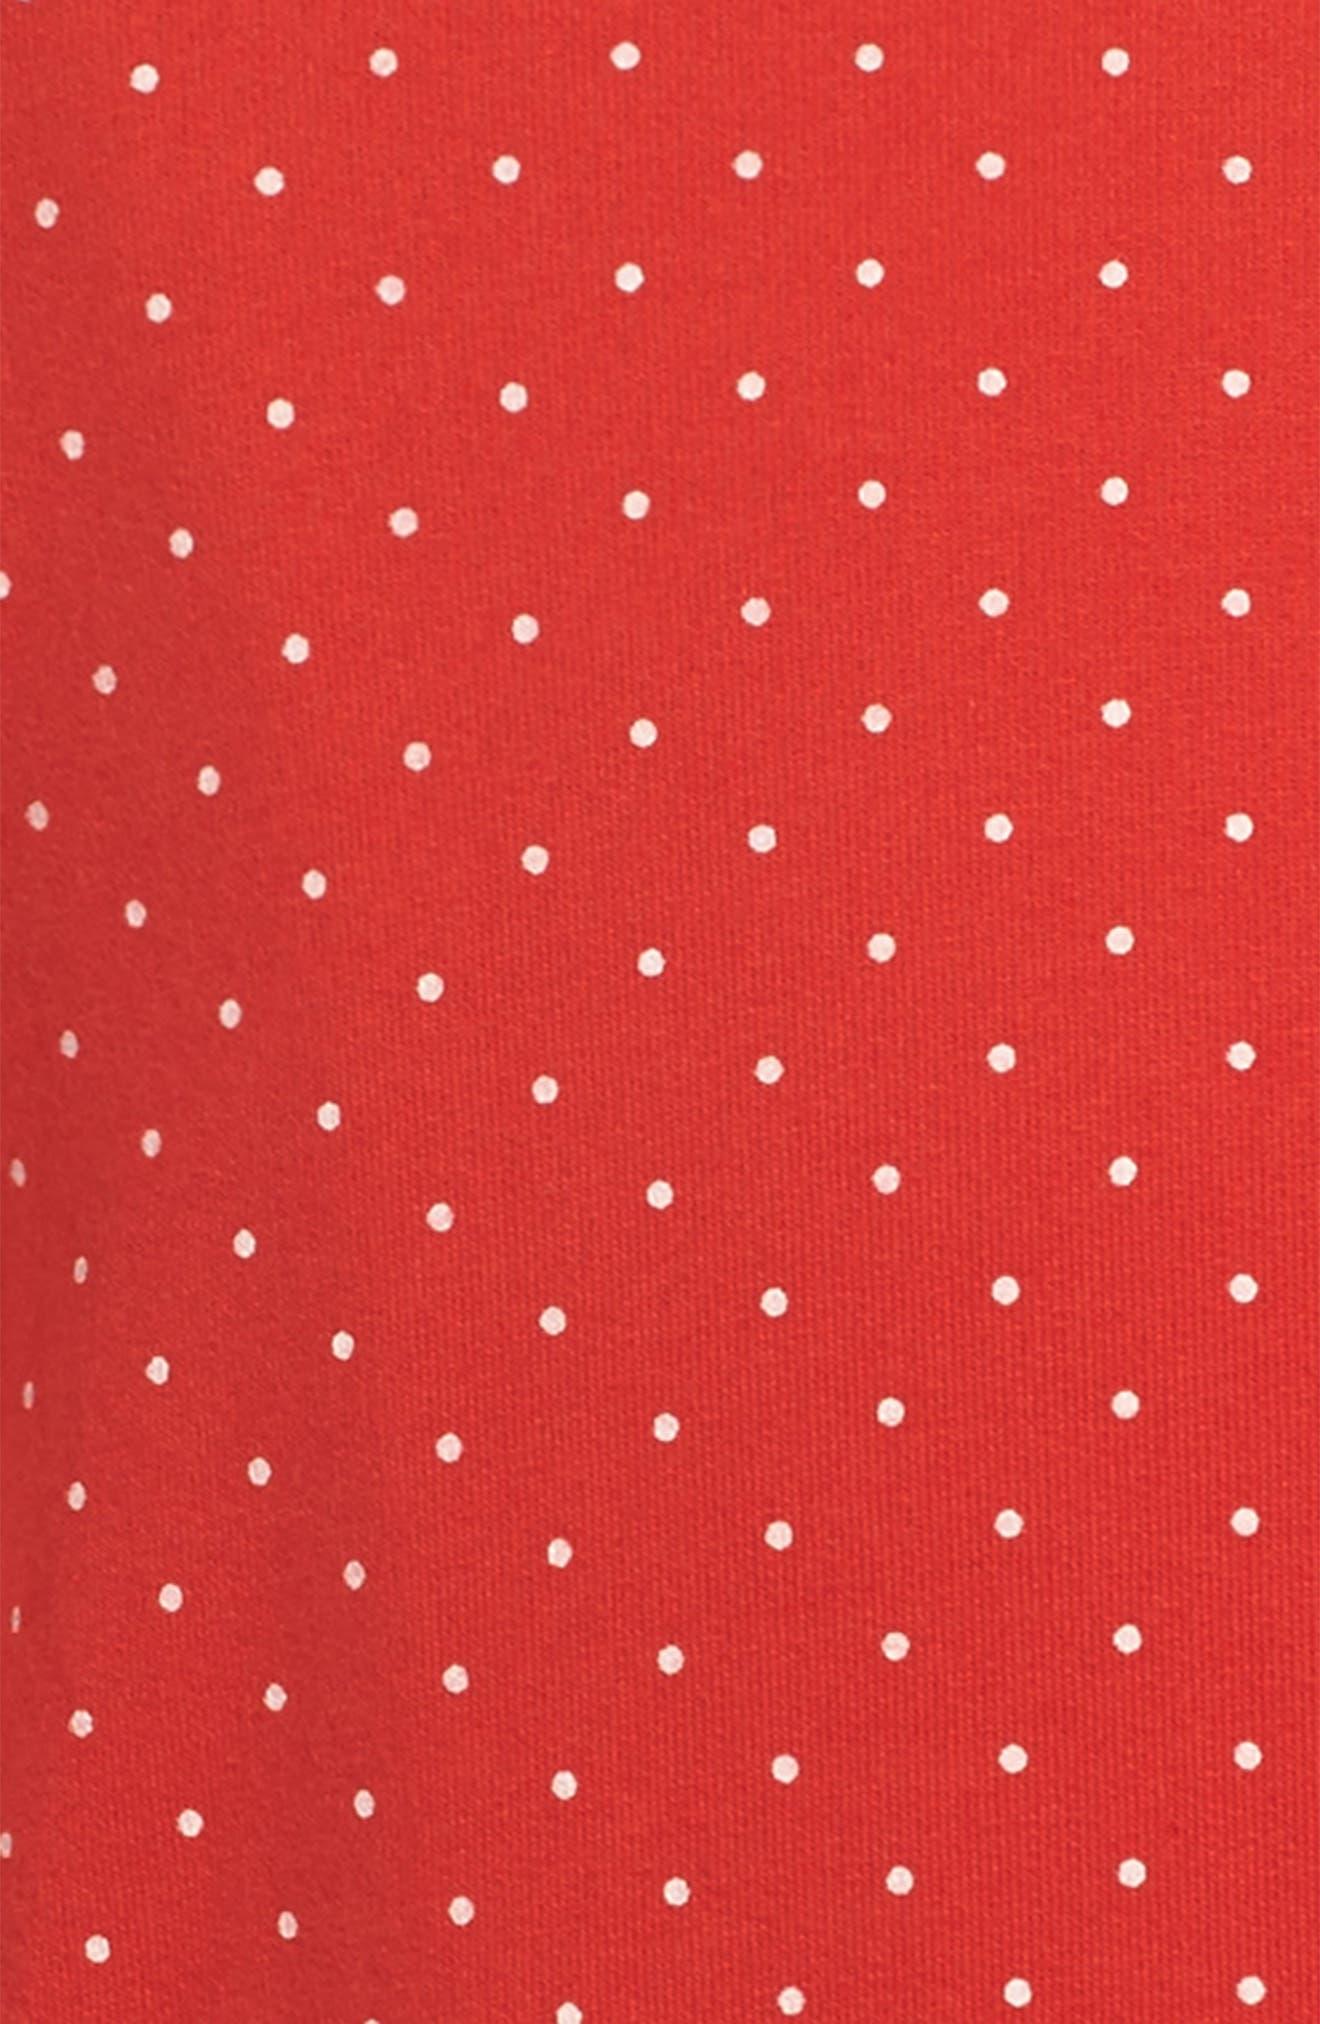 Dotty Dress,                             Alternate thumbnail 3, color,                             629